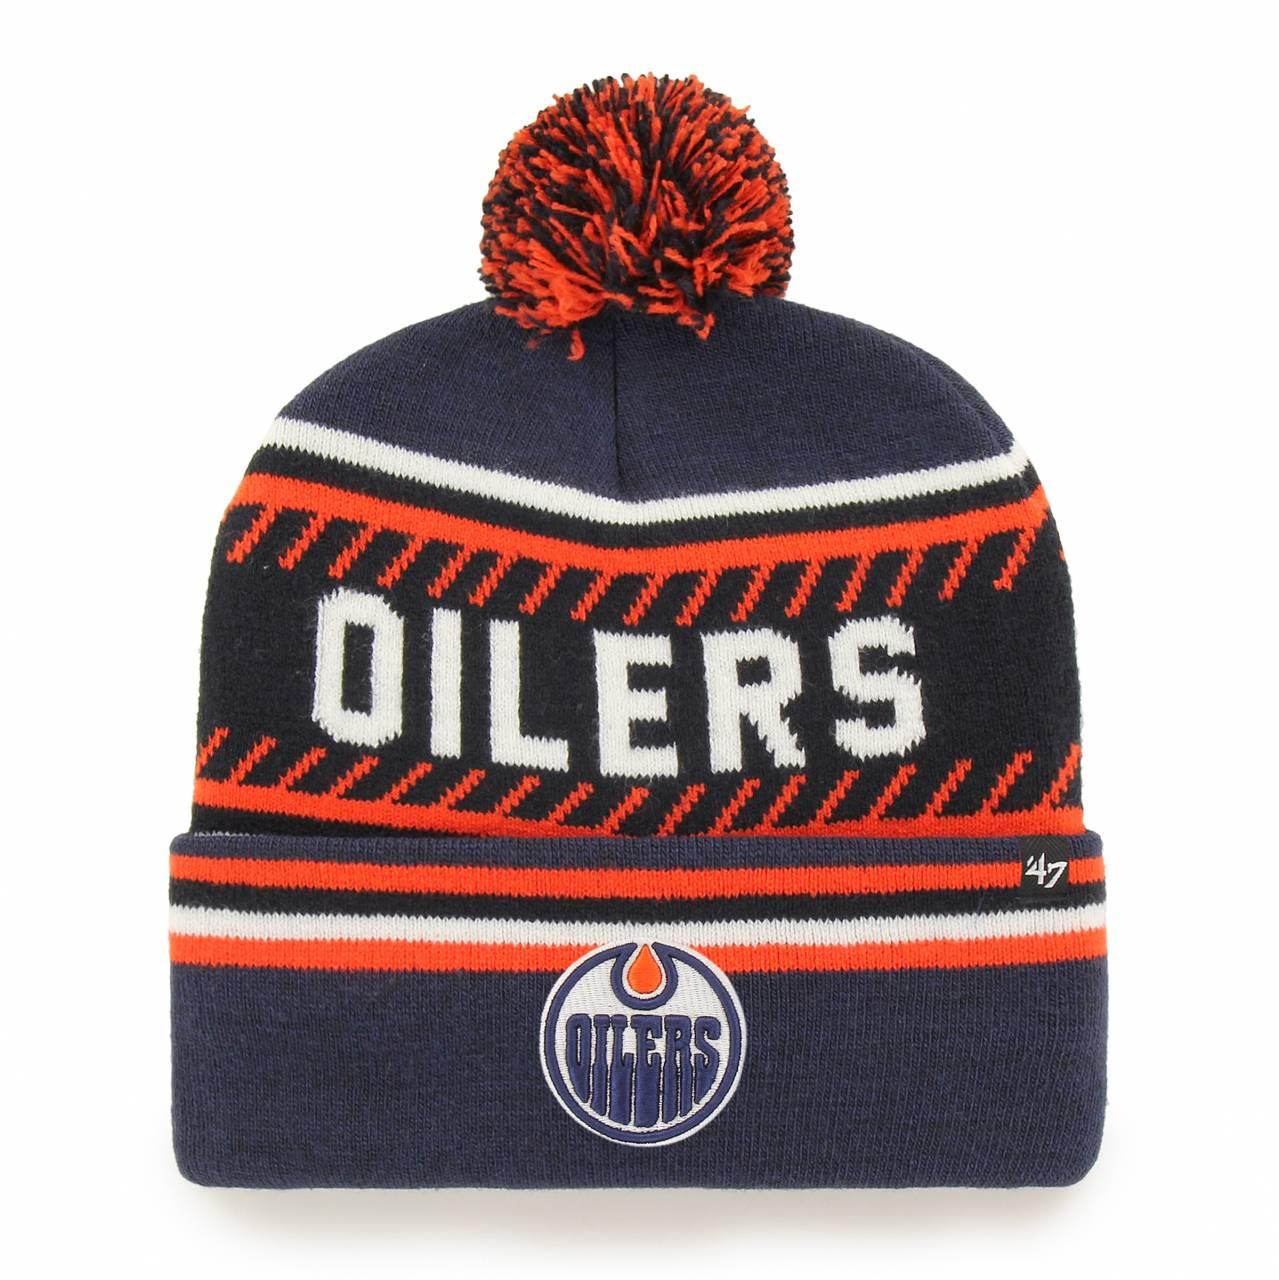 NHL EDMONTON OILERS ICE CAP ´47 CUFF KNIT NAVY